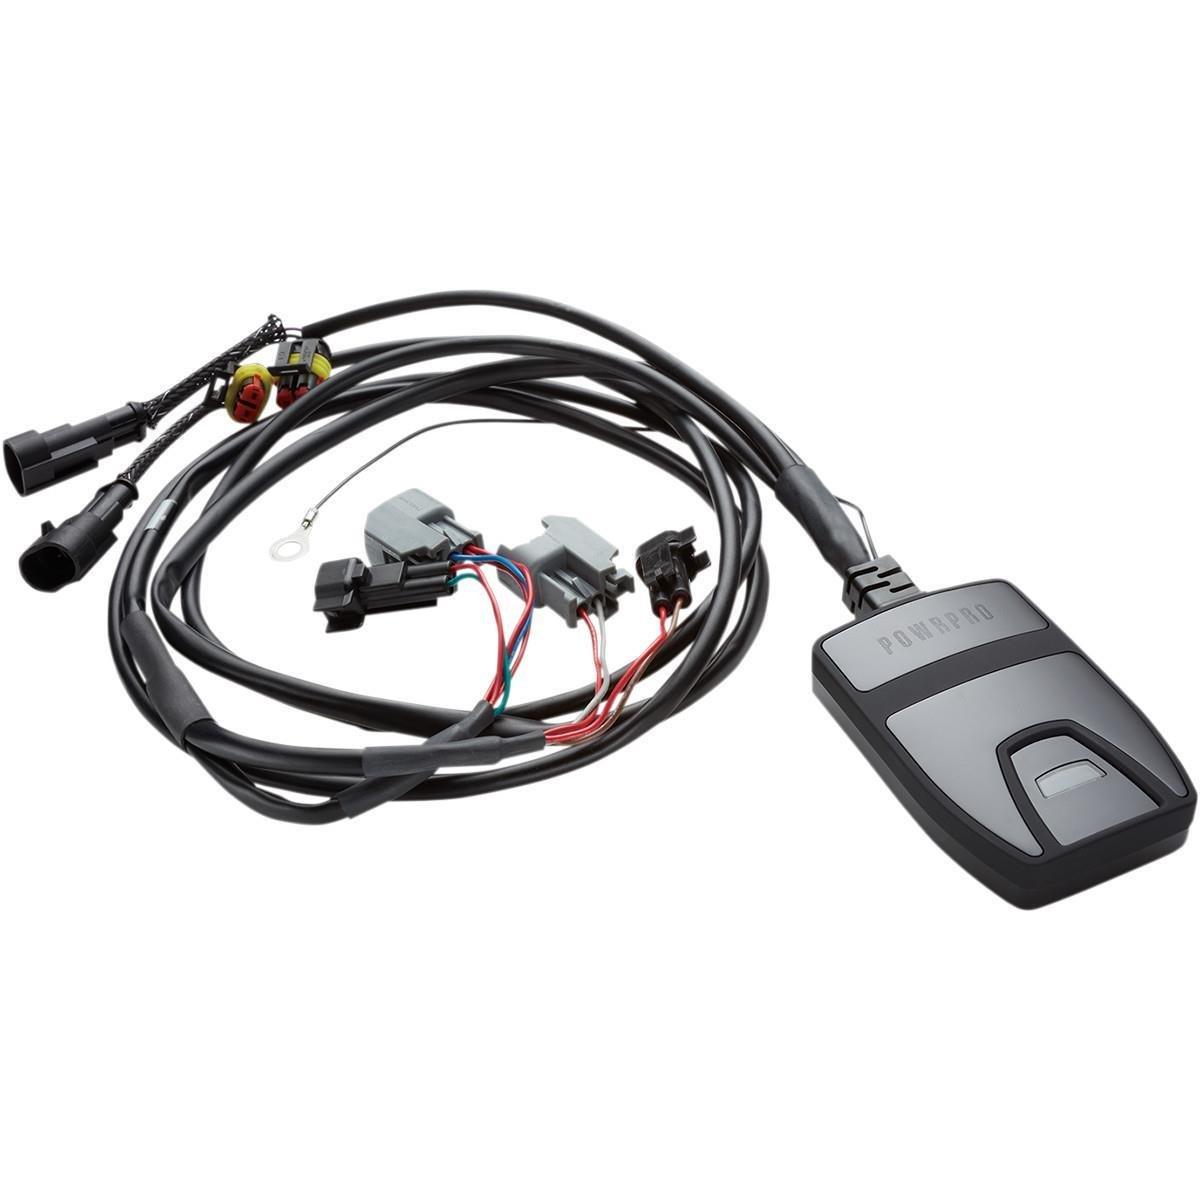 Cobra FI2000 PowrPro Black Fuel Management System